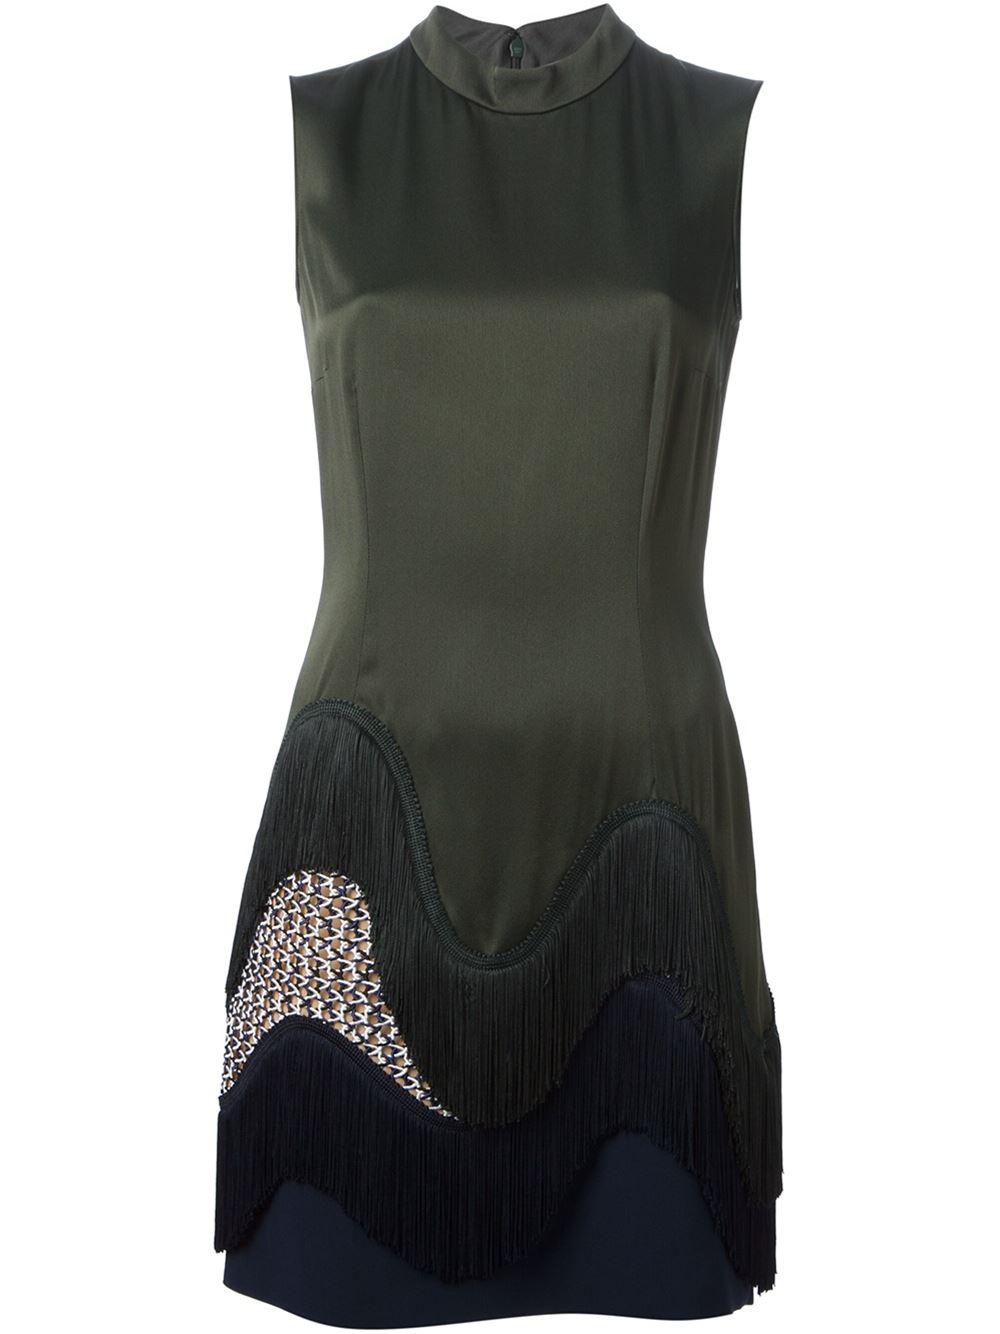 Stella mccartney fringe dress